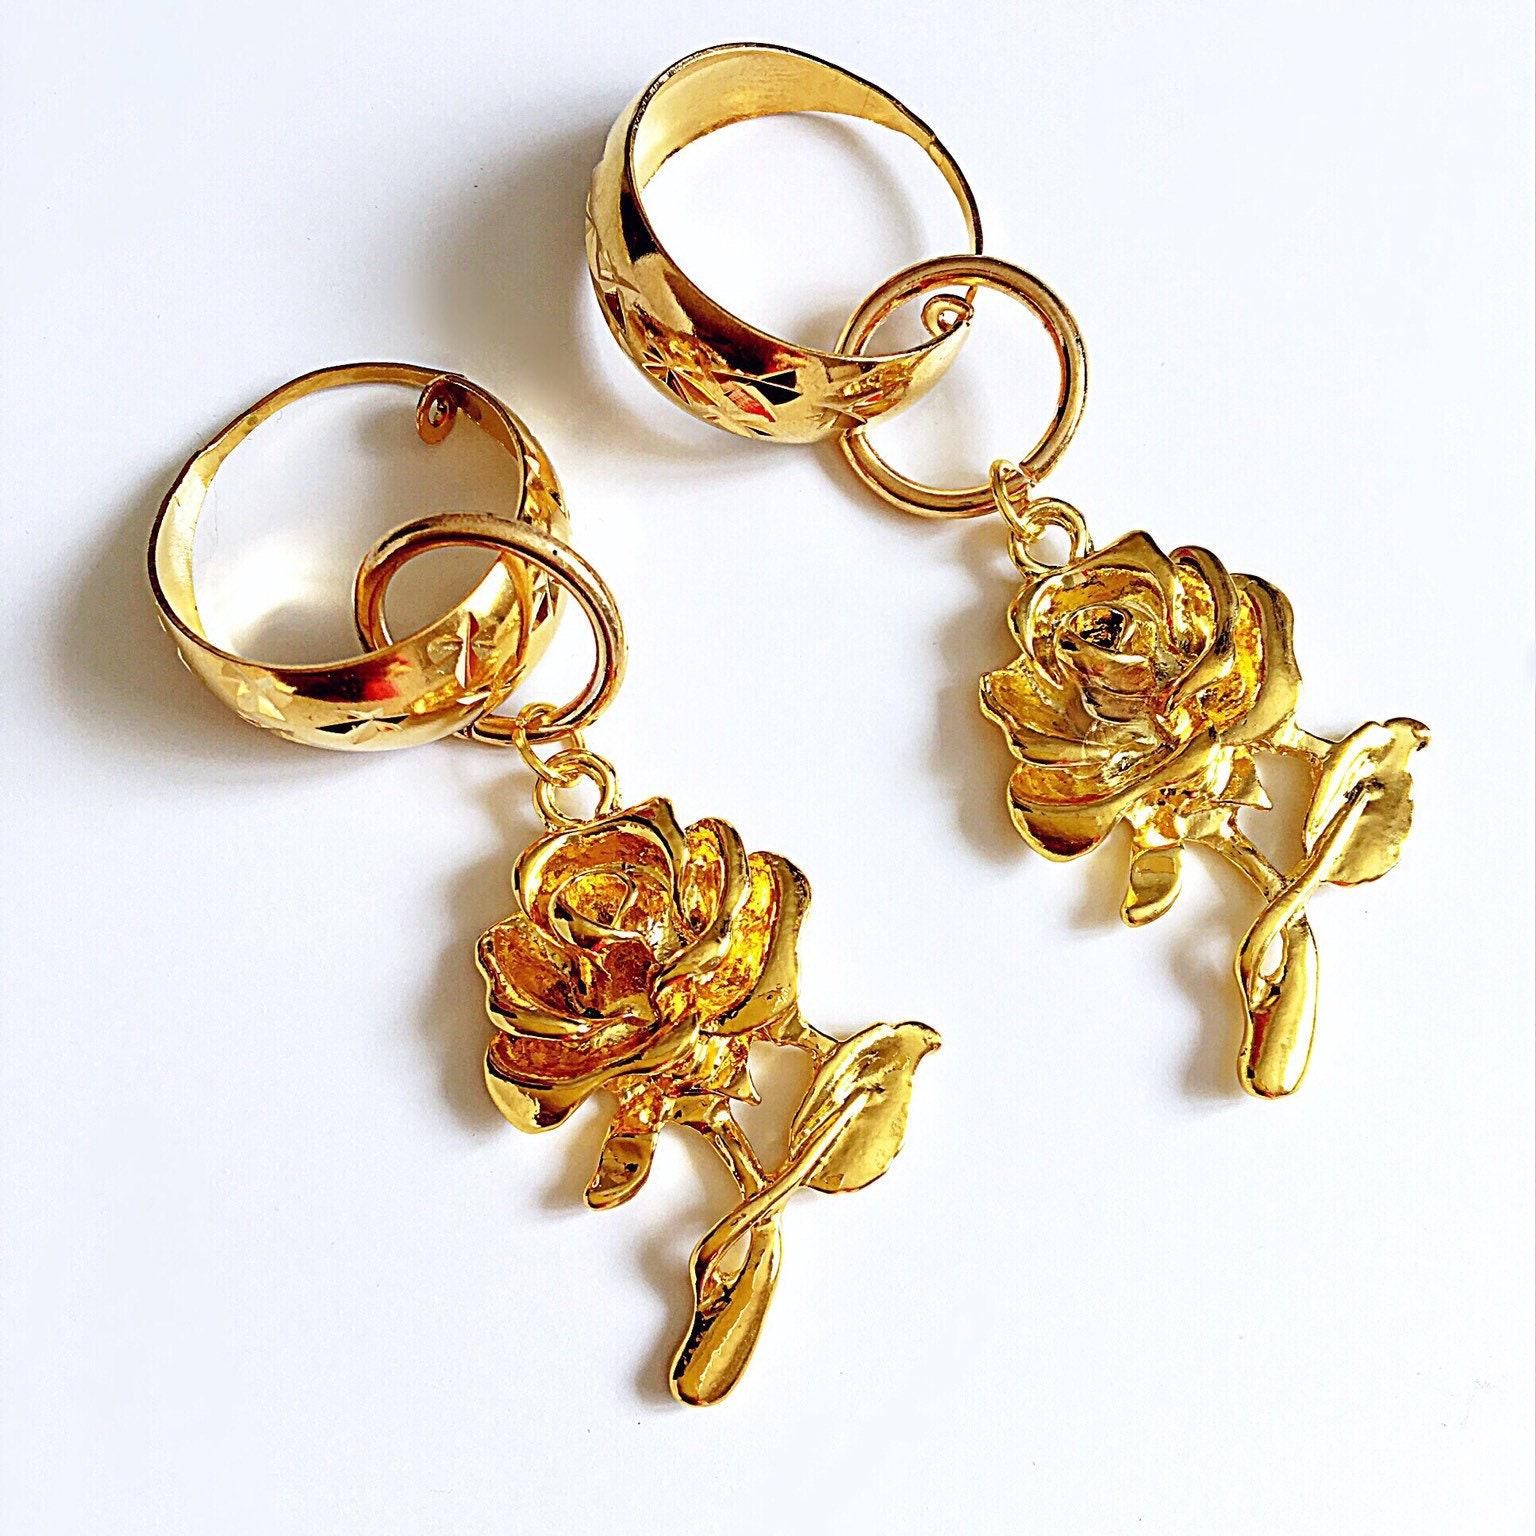 Small Hoop Silver French horn earrings handmade boho hippie y2k 90s 00s stylish cute  hoop pendant earrings